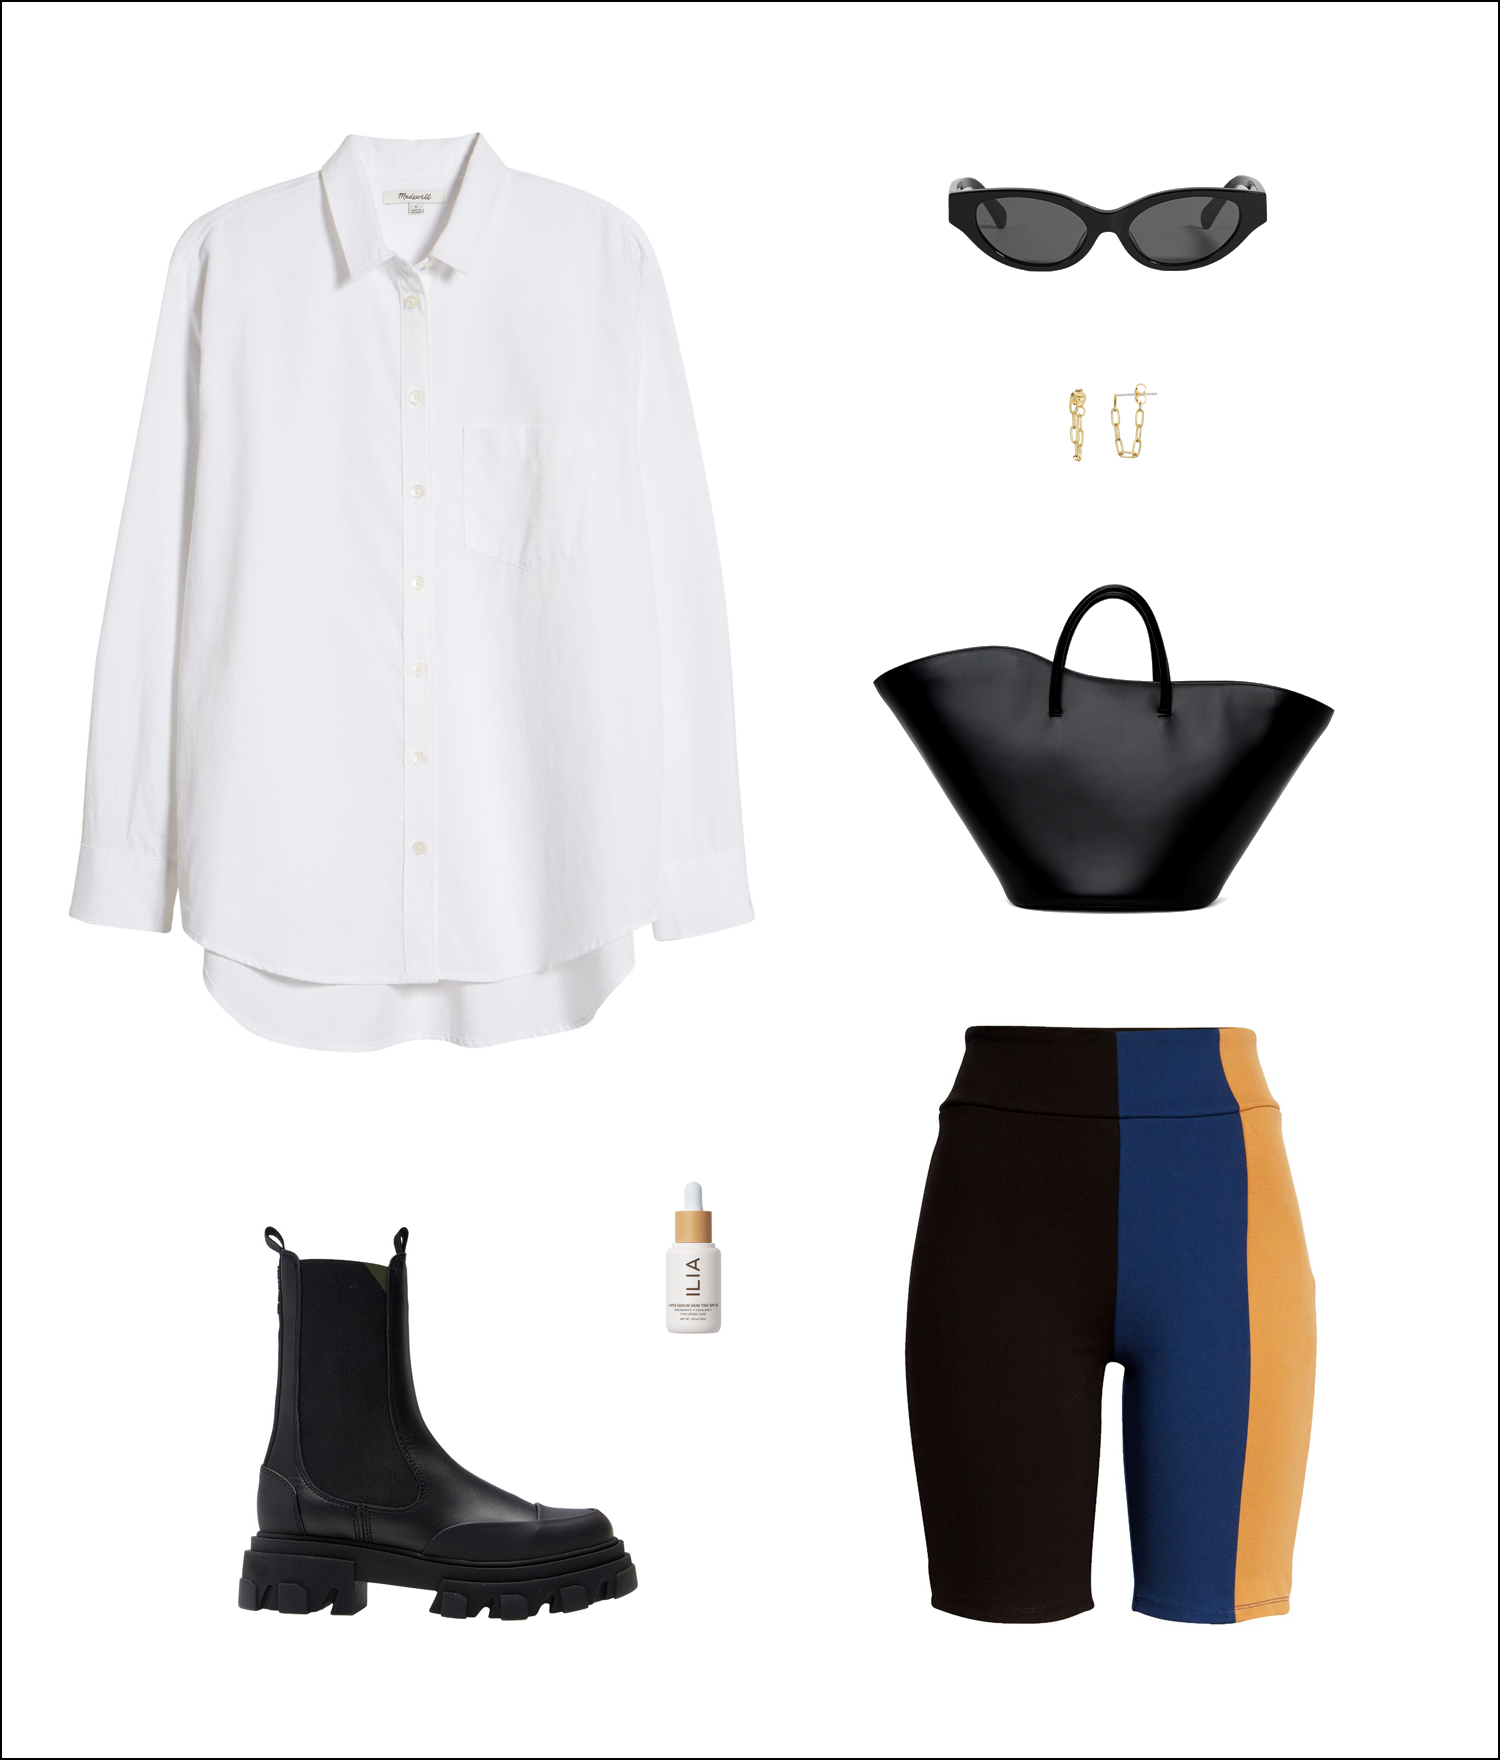 Spring Outfit Idea Trends —under-$ 100 white button-down shirt, black sunglasses, chain hoop earrings, Little Liffner tote bag, Staud color block biker shorts, Ilia skin tint, Ganni lug-sole boots